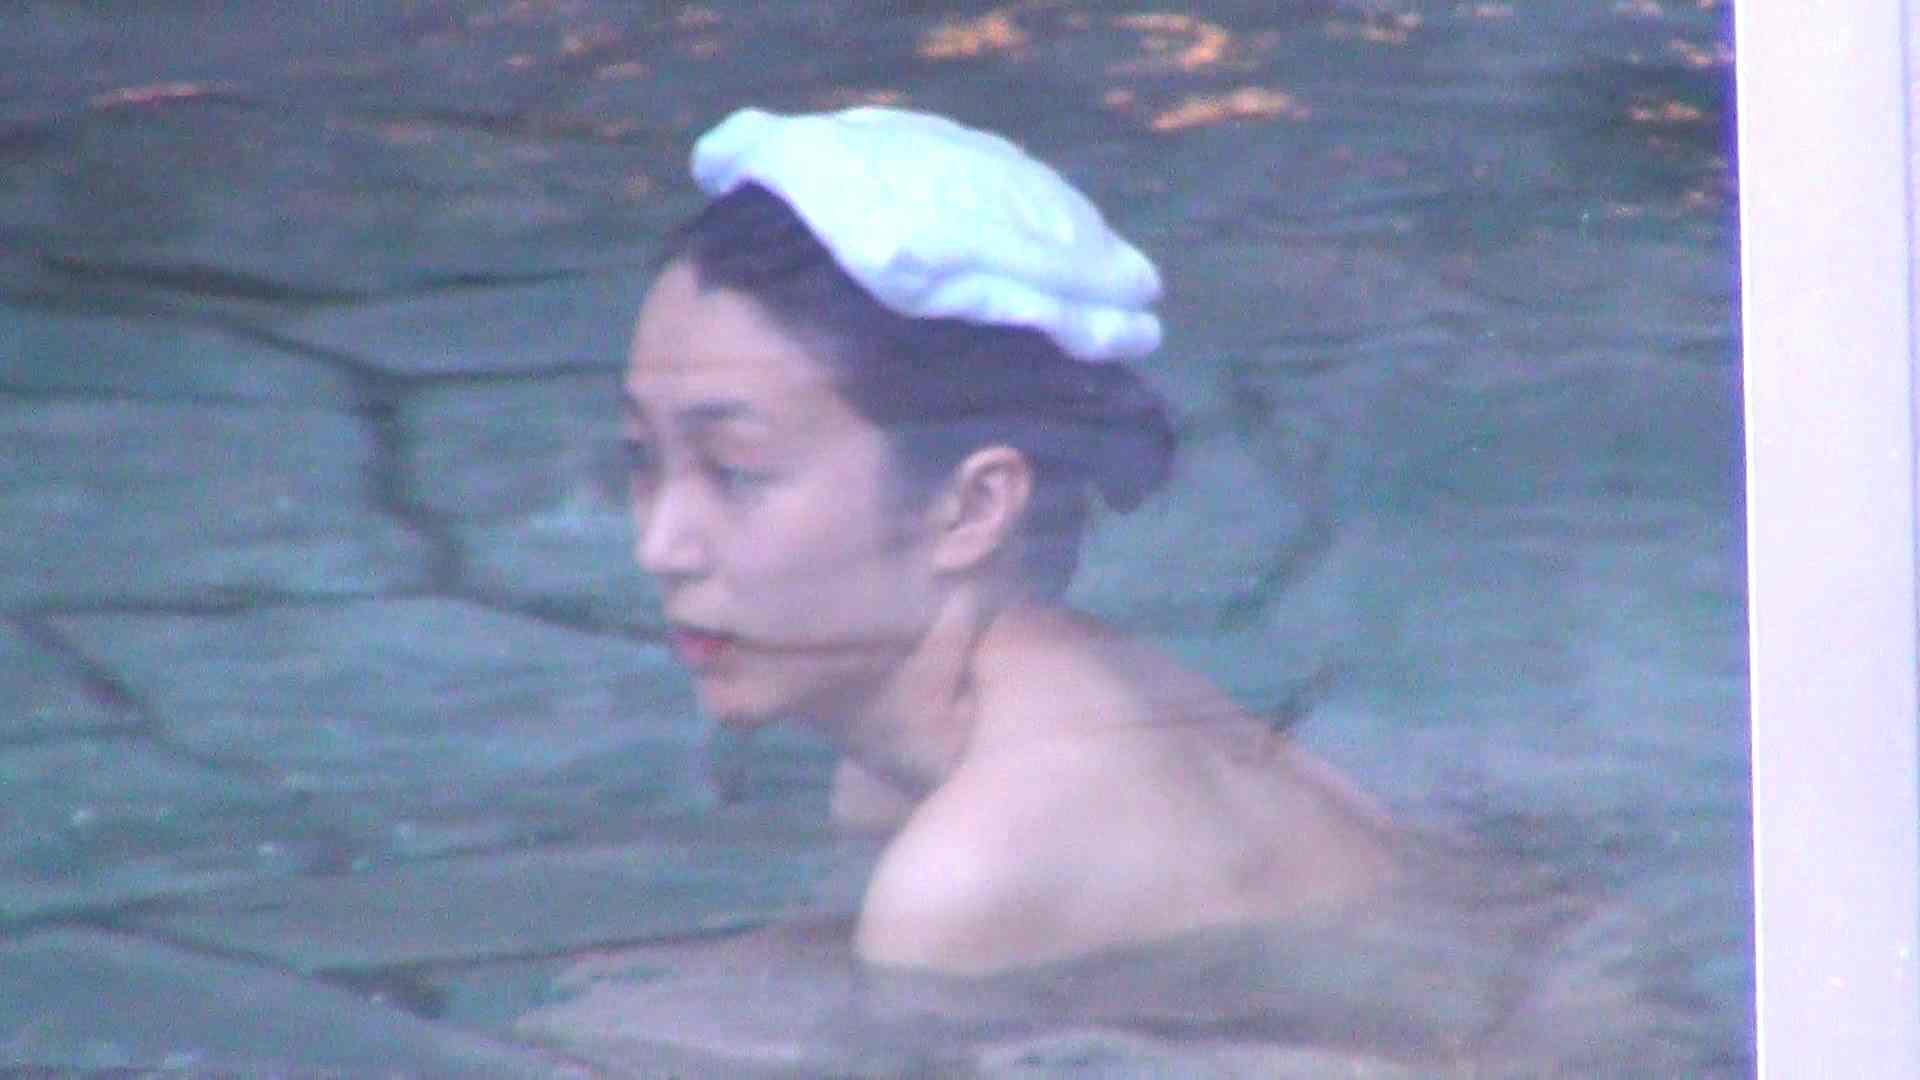 Aquaな露天風呂Vol.290 OL  109連発 31